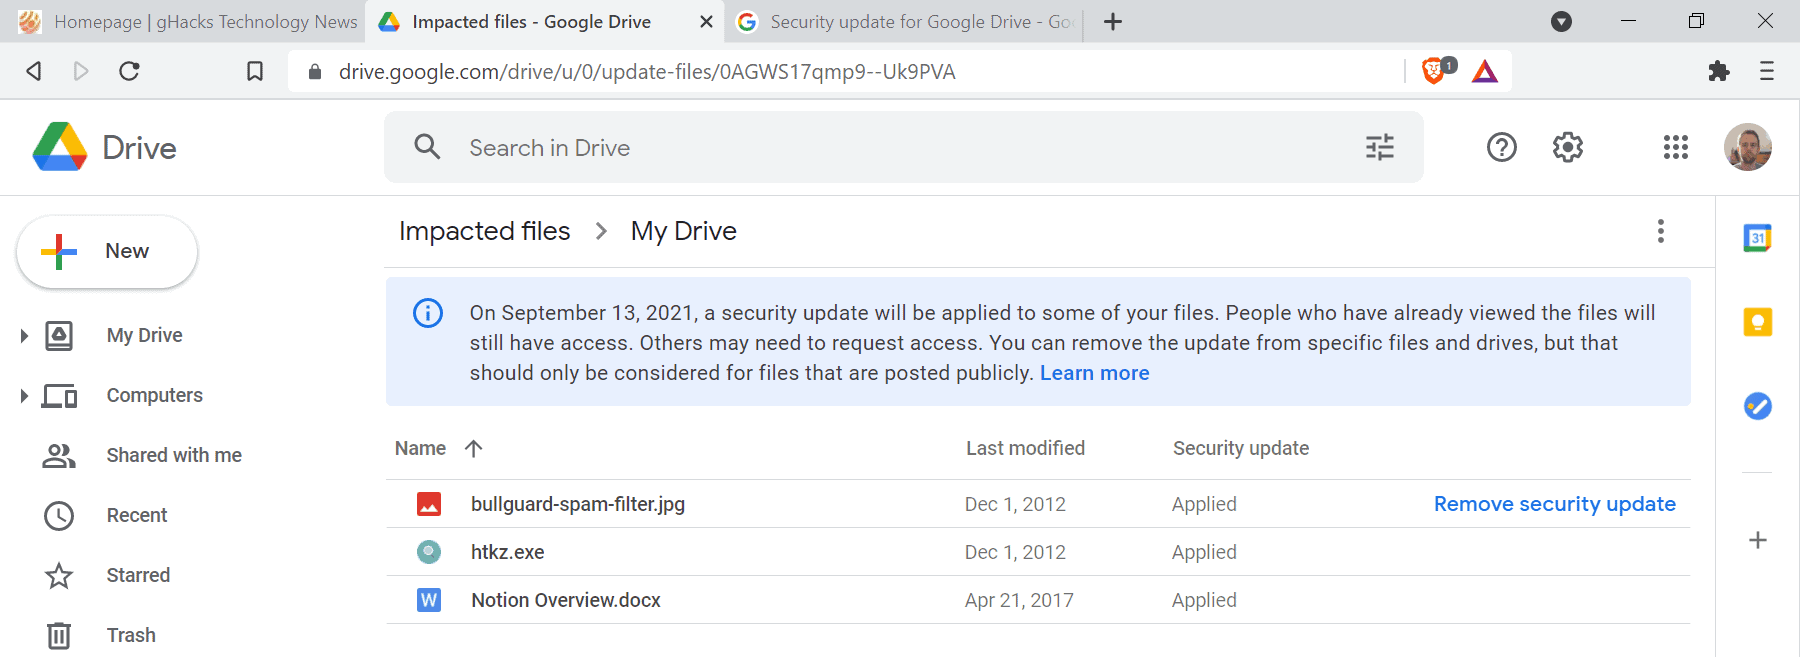 google drive impacted files